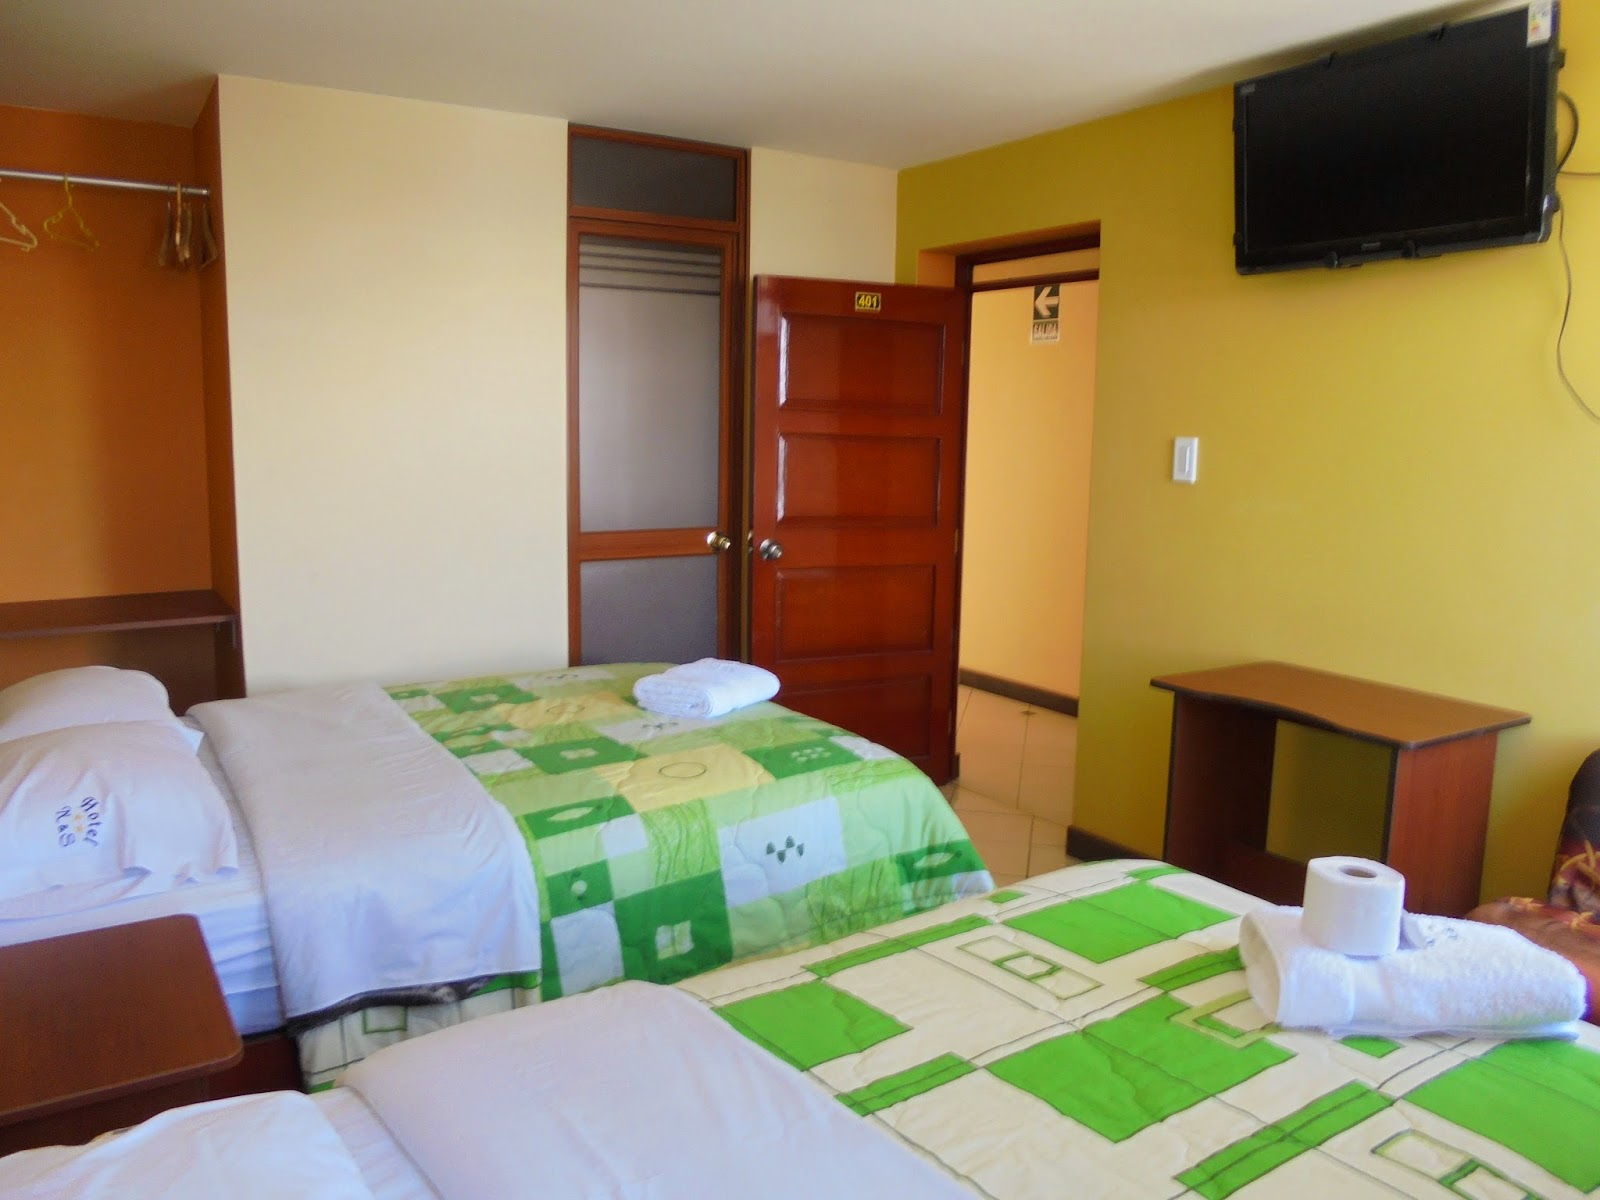 Hotel norsi huancayo habitaci n 401 familiar for Hotel granada habitacion familiar